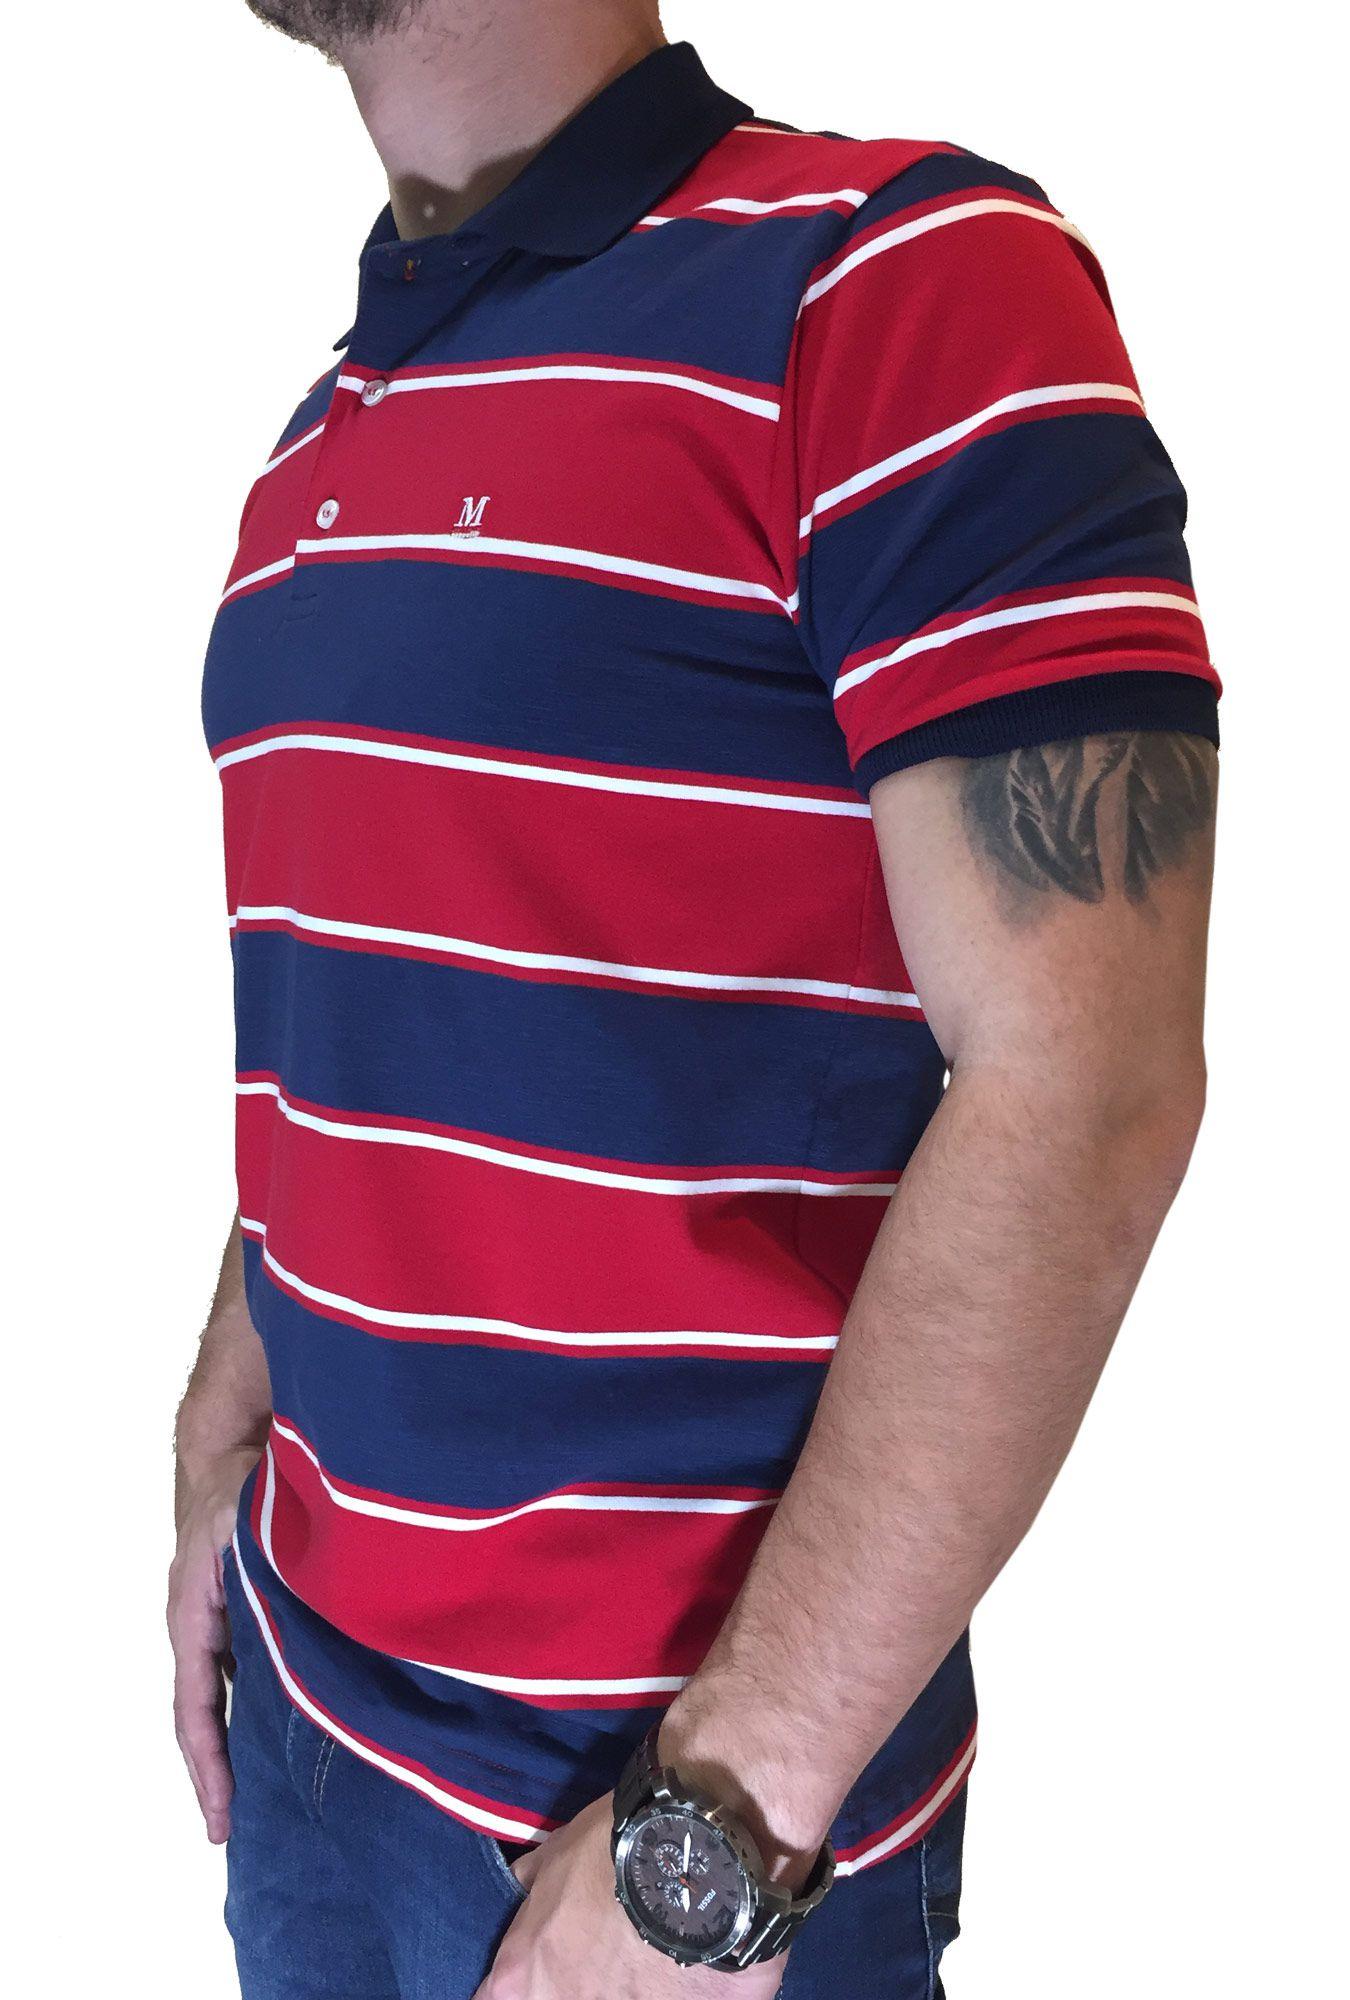 Polo Masculina Minuty Listras Vermelho e Azul Marinho Ref. 2700